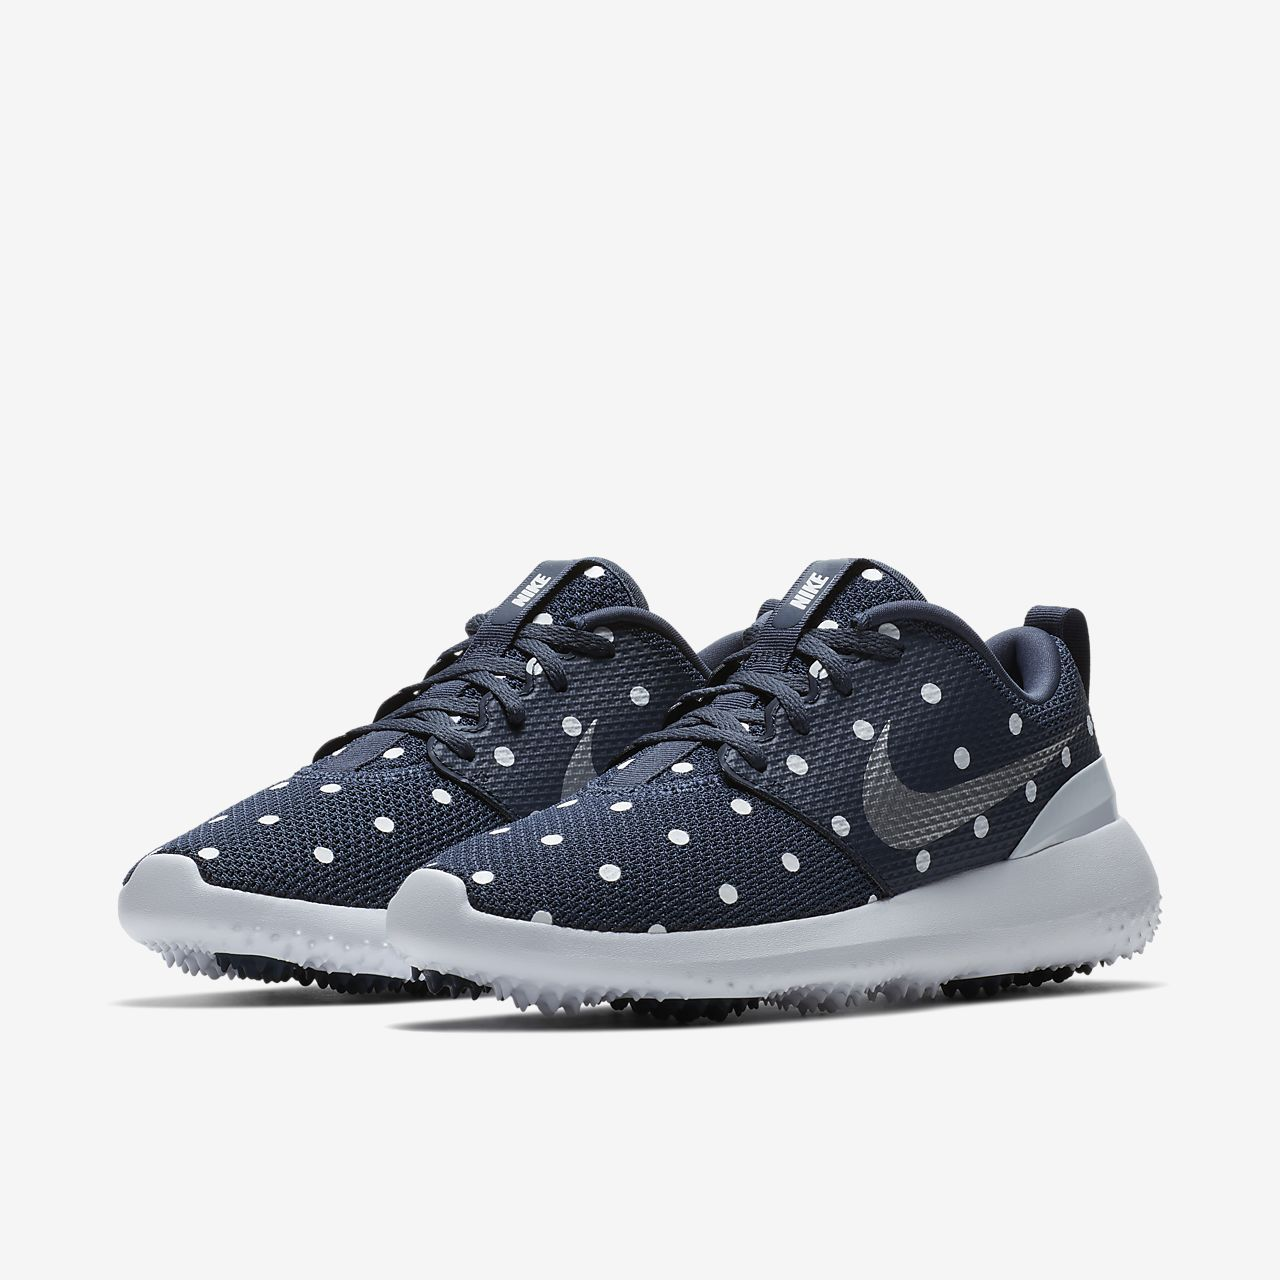 promo code c36fb c4bbd Nike Women's Golf Shoe Roshe G | My Style | Womens golf shoes, Golf ...